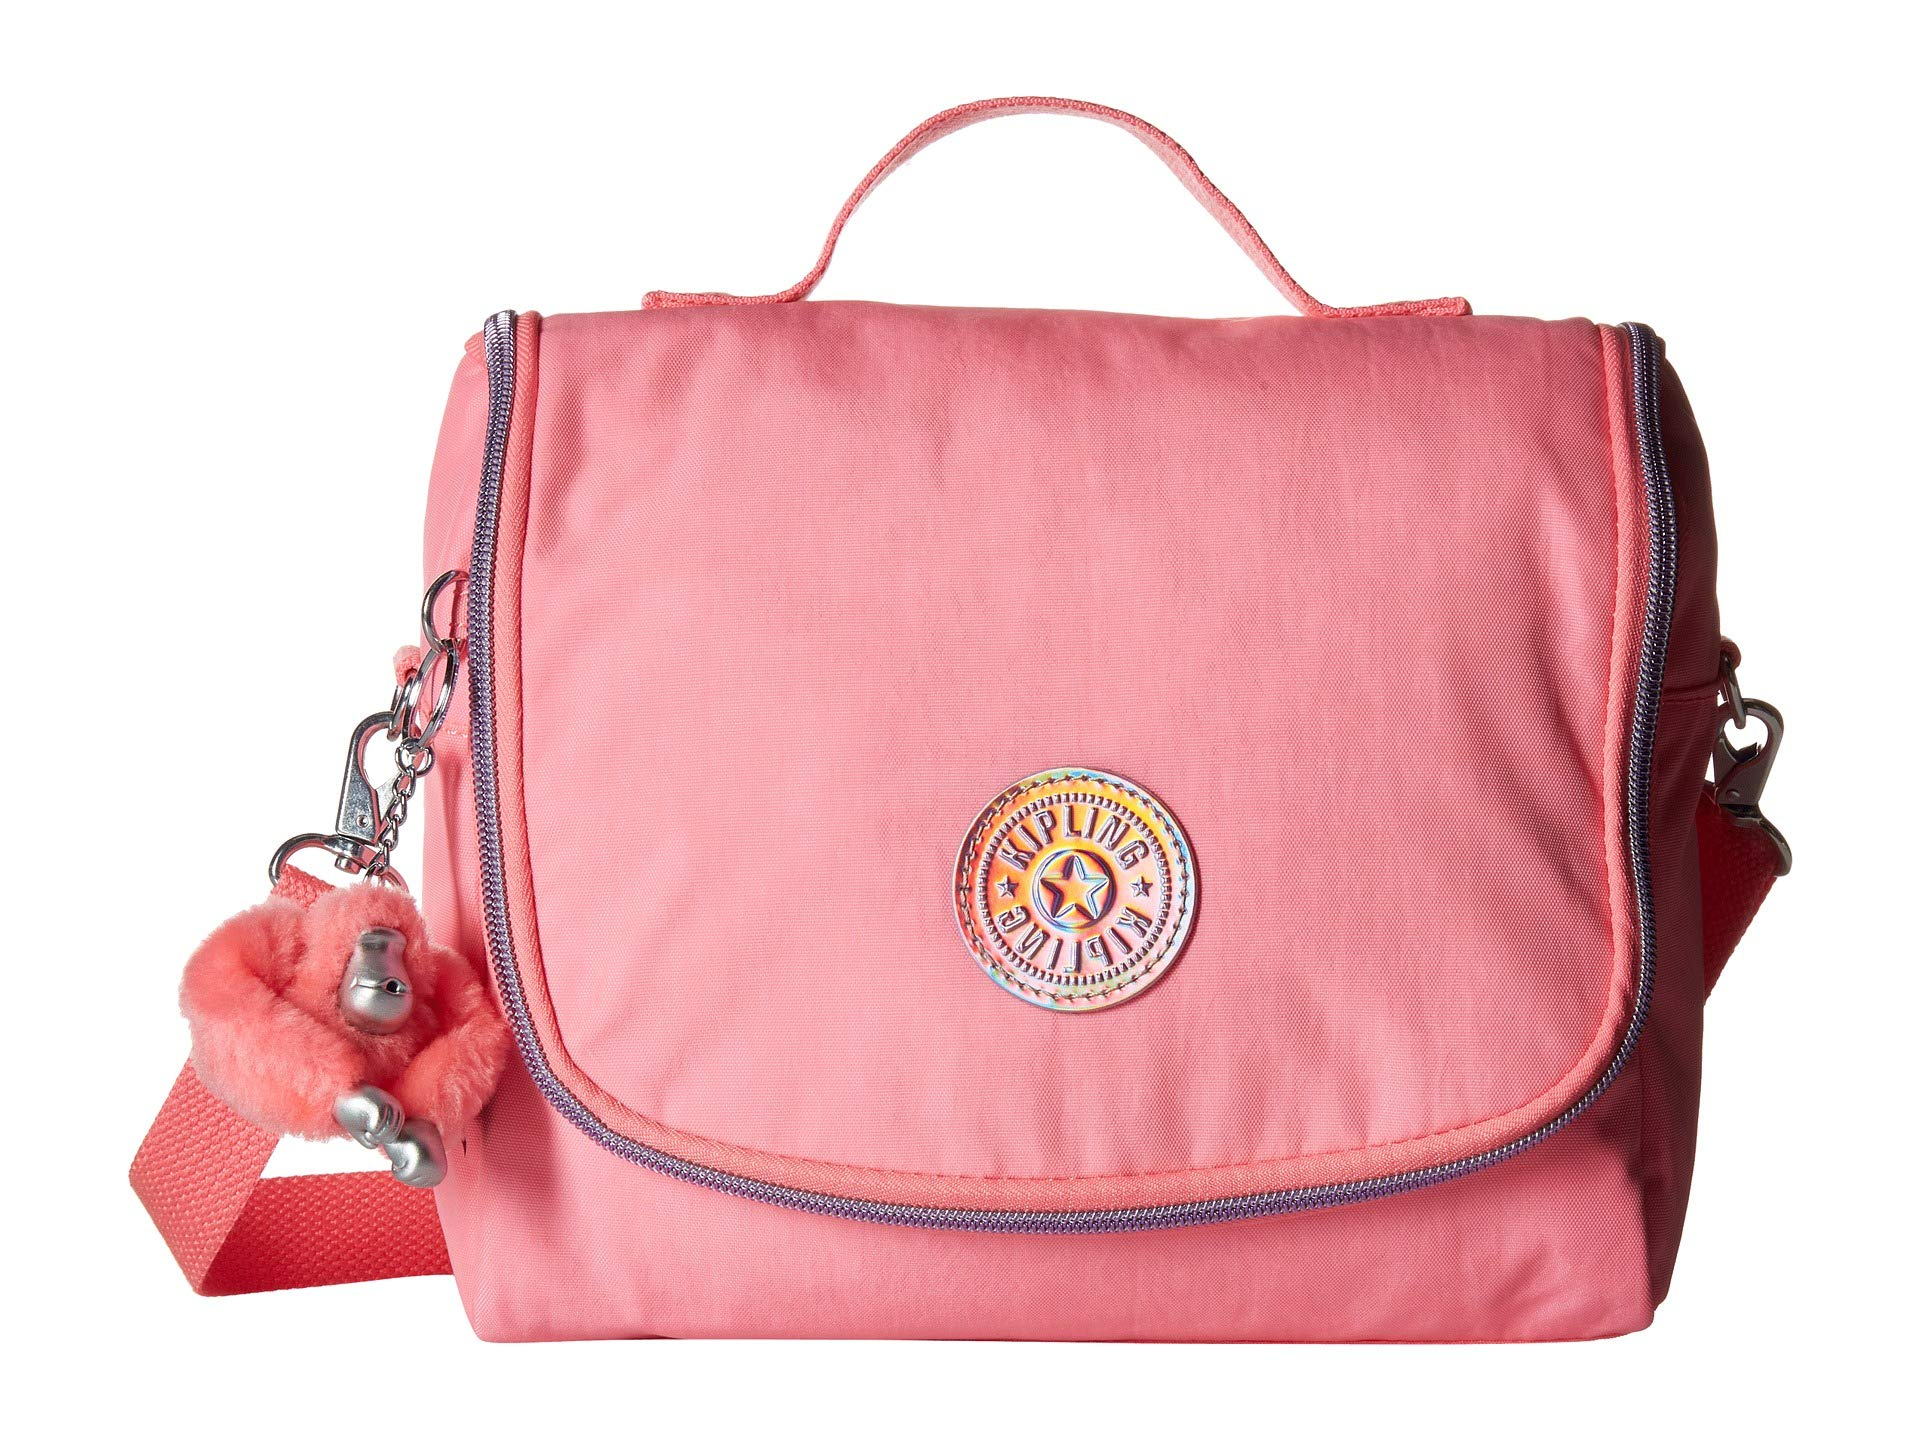 Kipling Kichirou Insulated Lunch Bag, Removable, Adjustable Crossbody Strap, Zip Closure, Conversation Heart